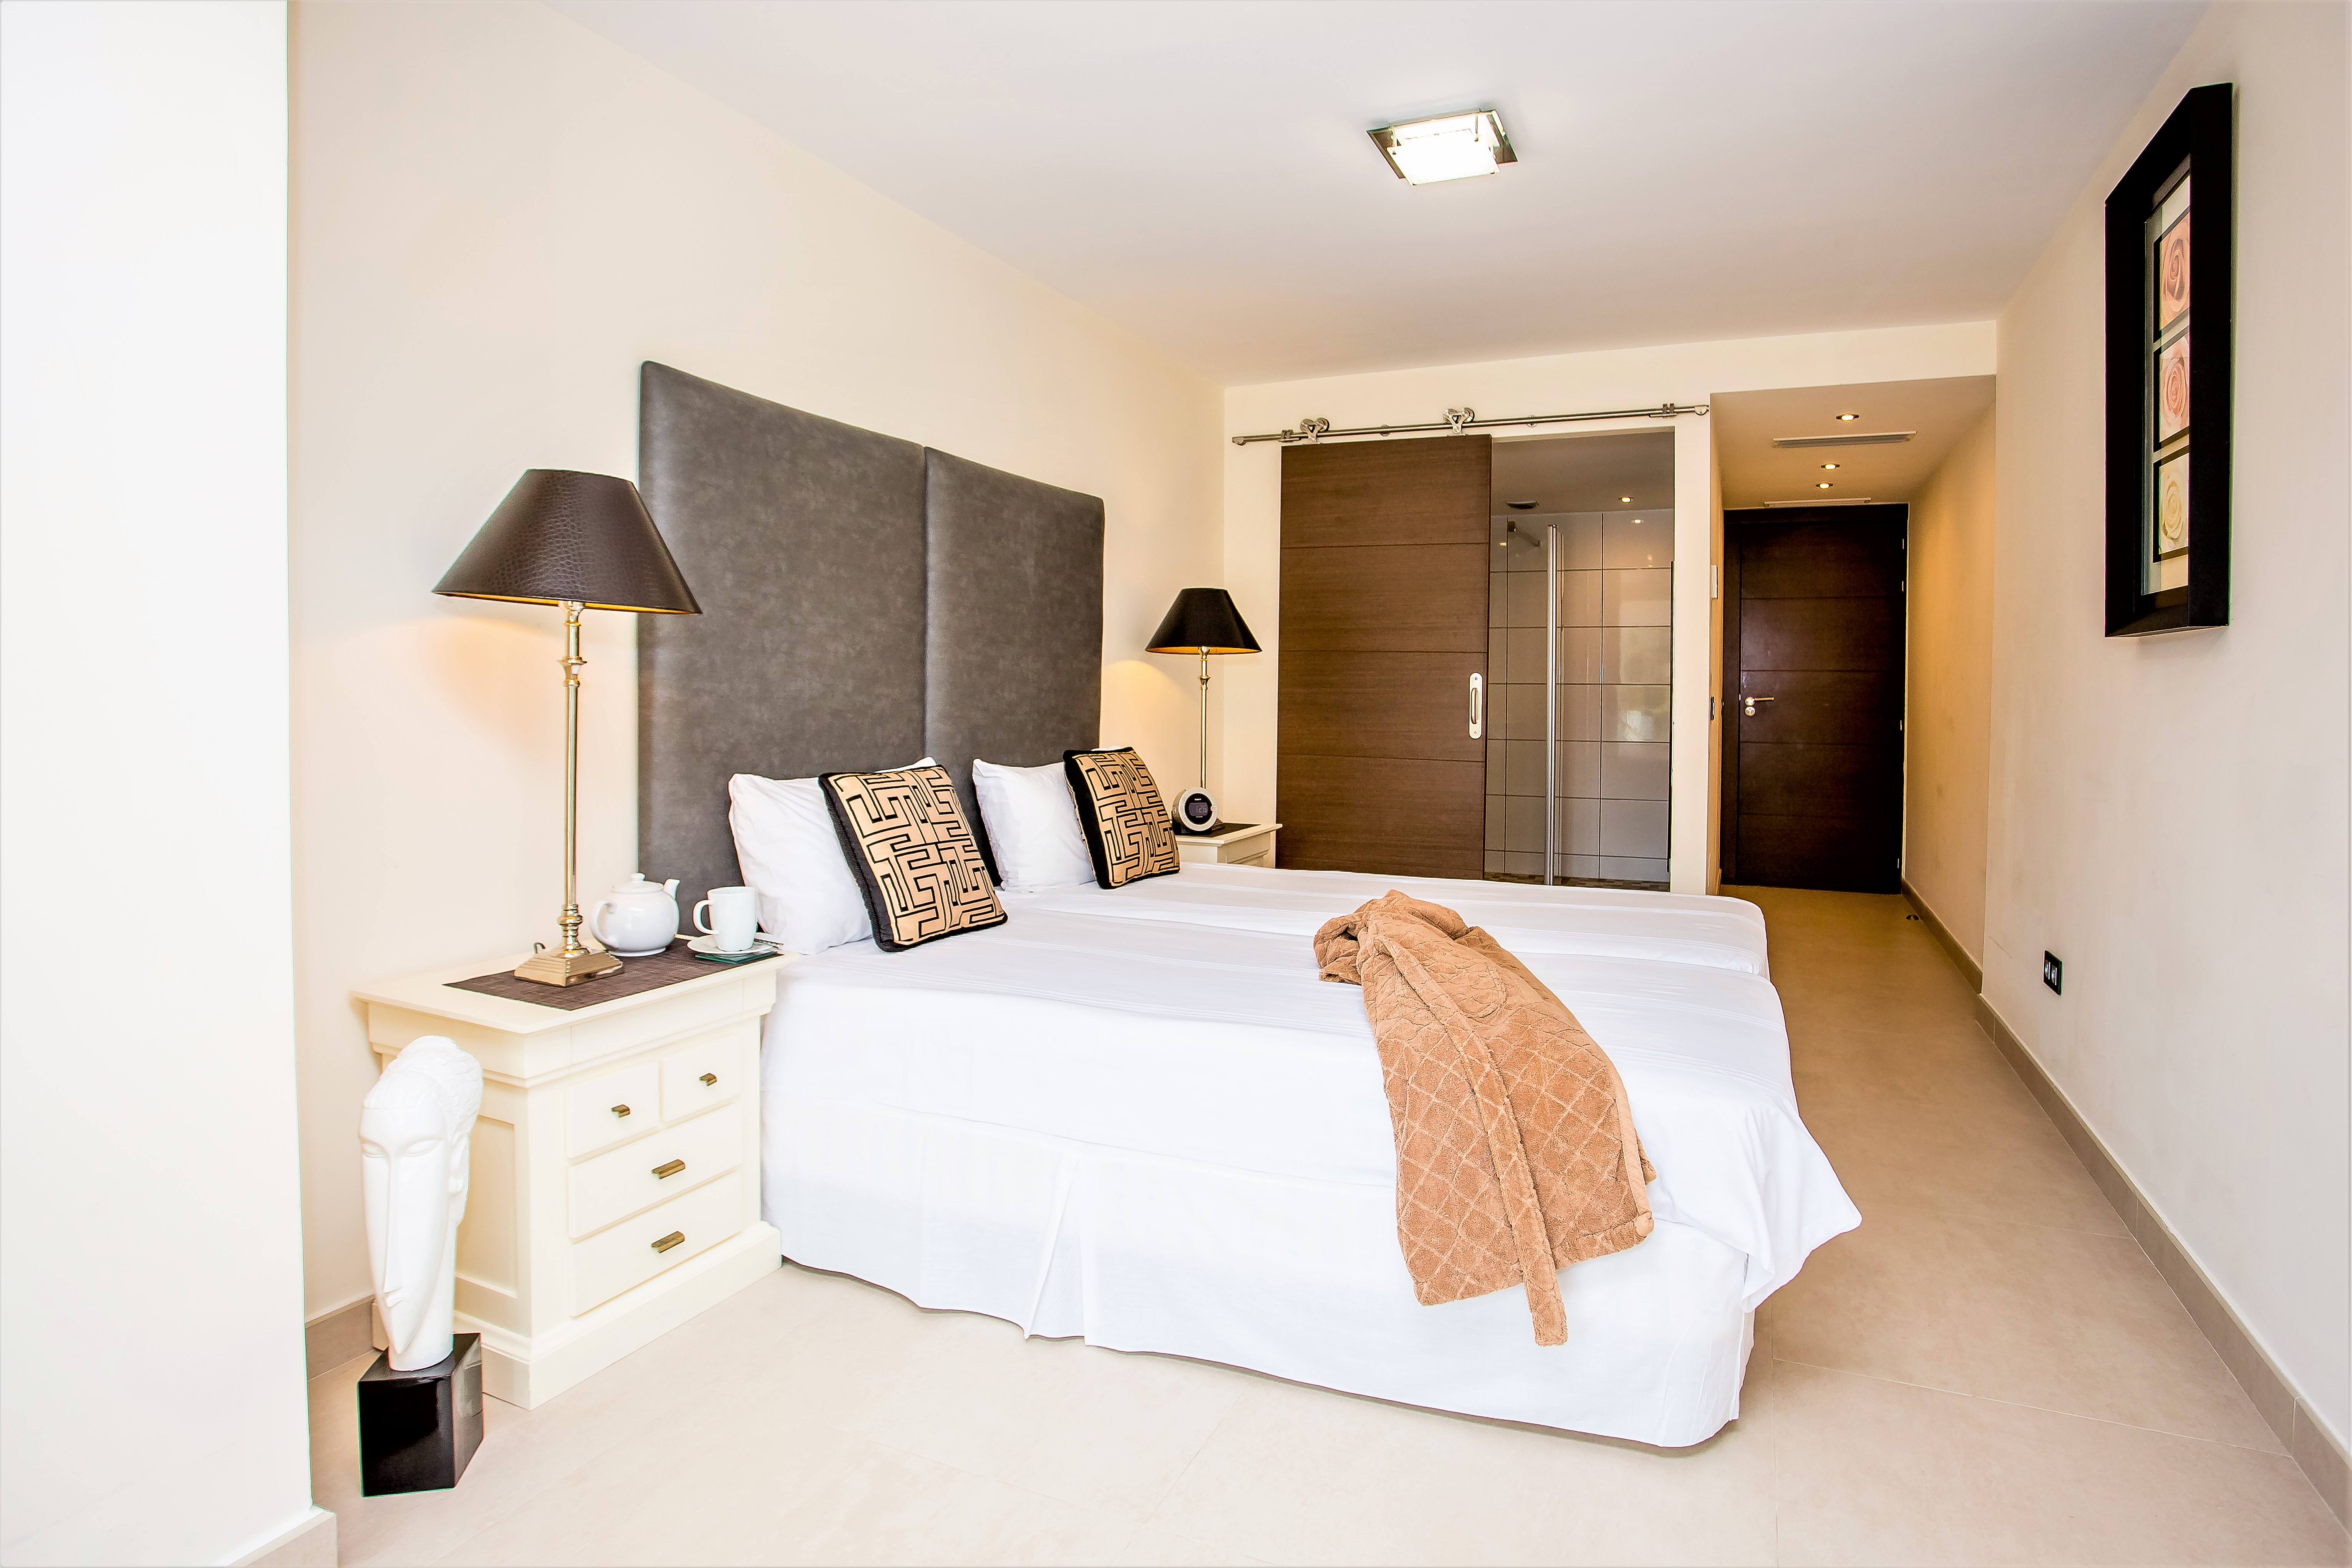 Apartment 5 B R VILLA BY PUERTO BANUS   SEA 5min                                photo 20203641